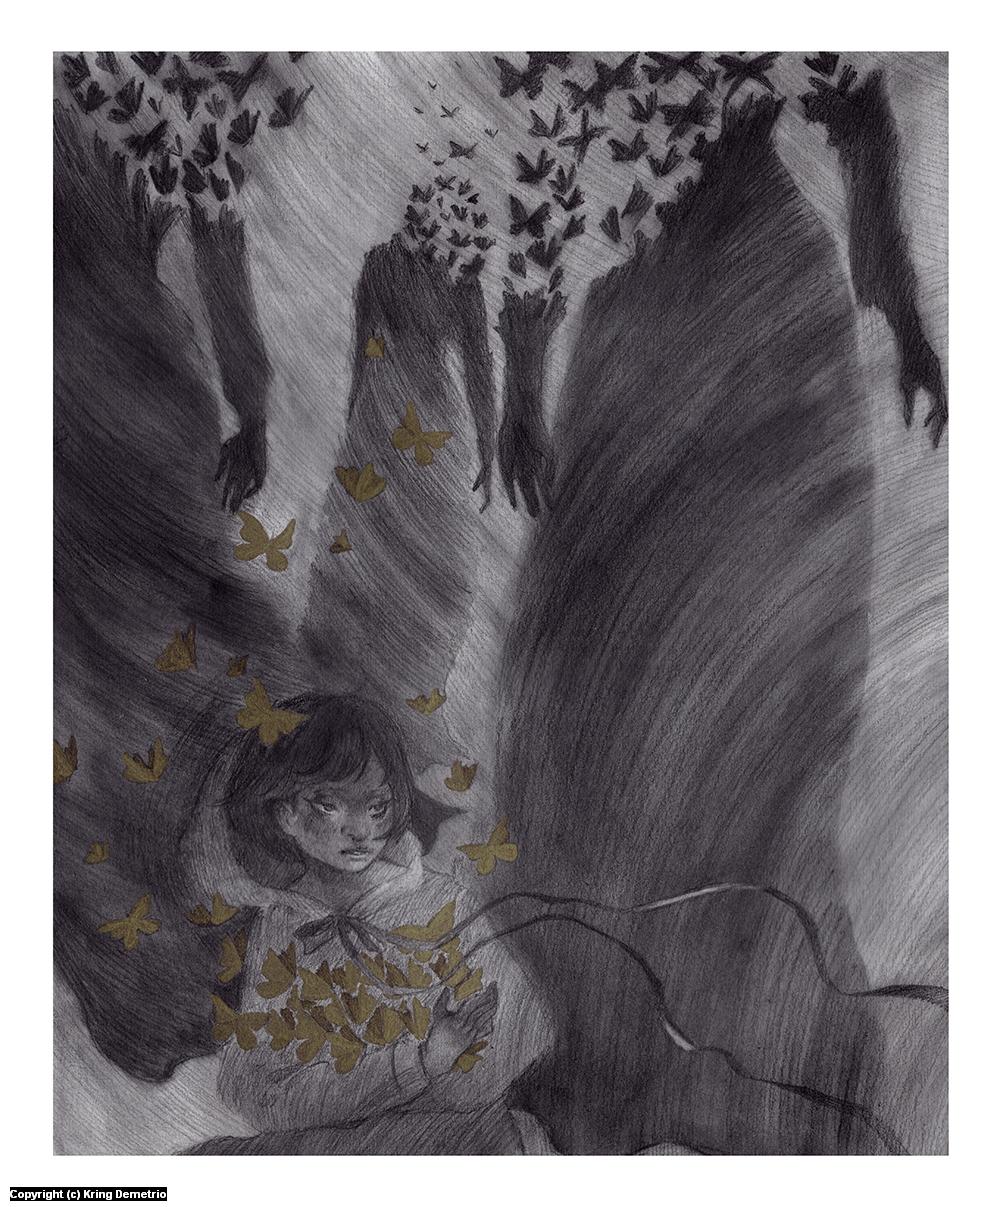 Butterflies From Moths Artwork by Kring Demetrio